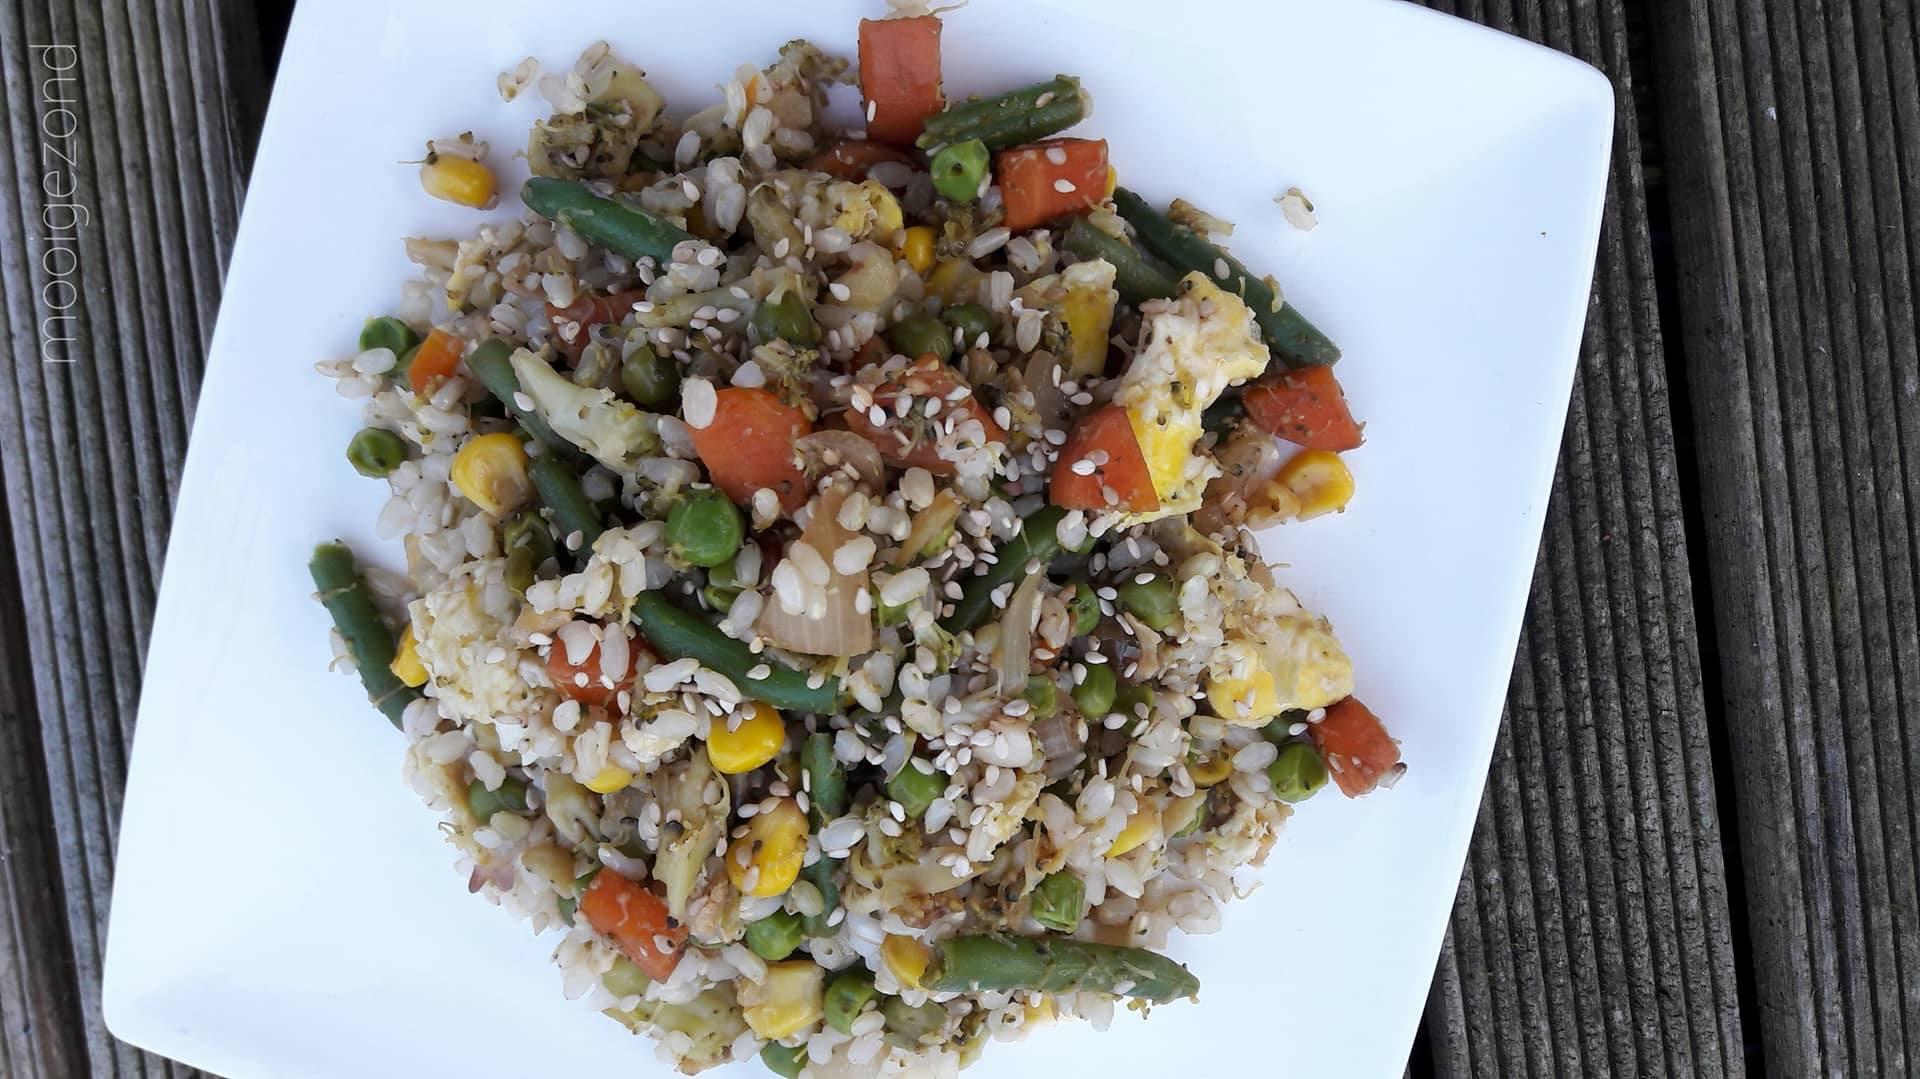 rijstschotel, vegetarisch, groente, vega rijstschotel, sperziebonen, erwten, mais, broccoli, ui